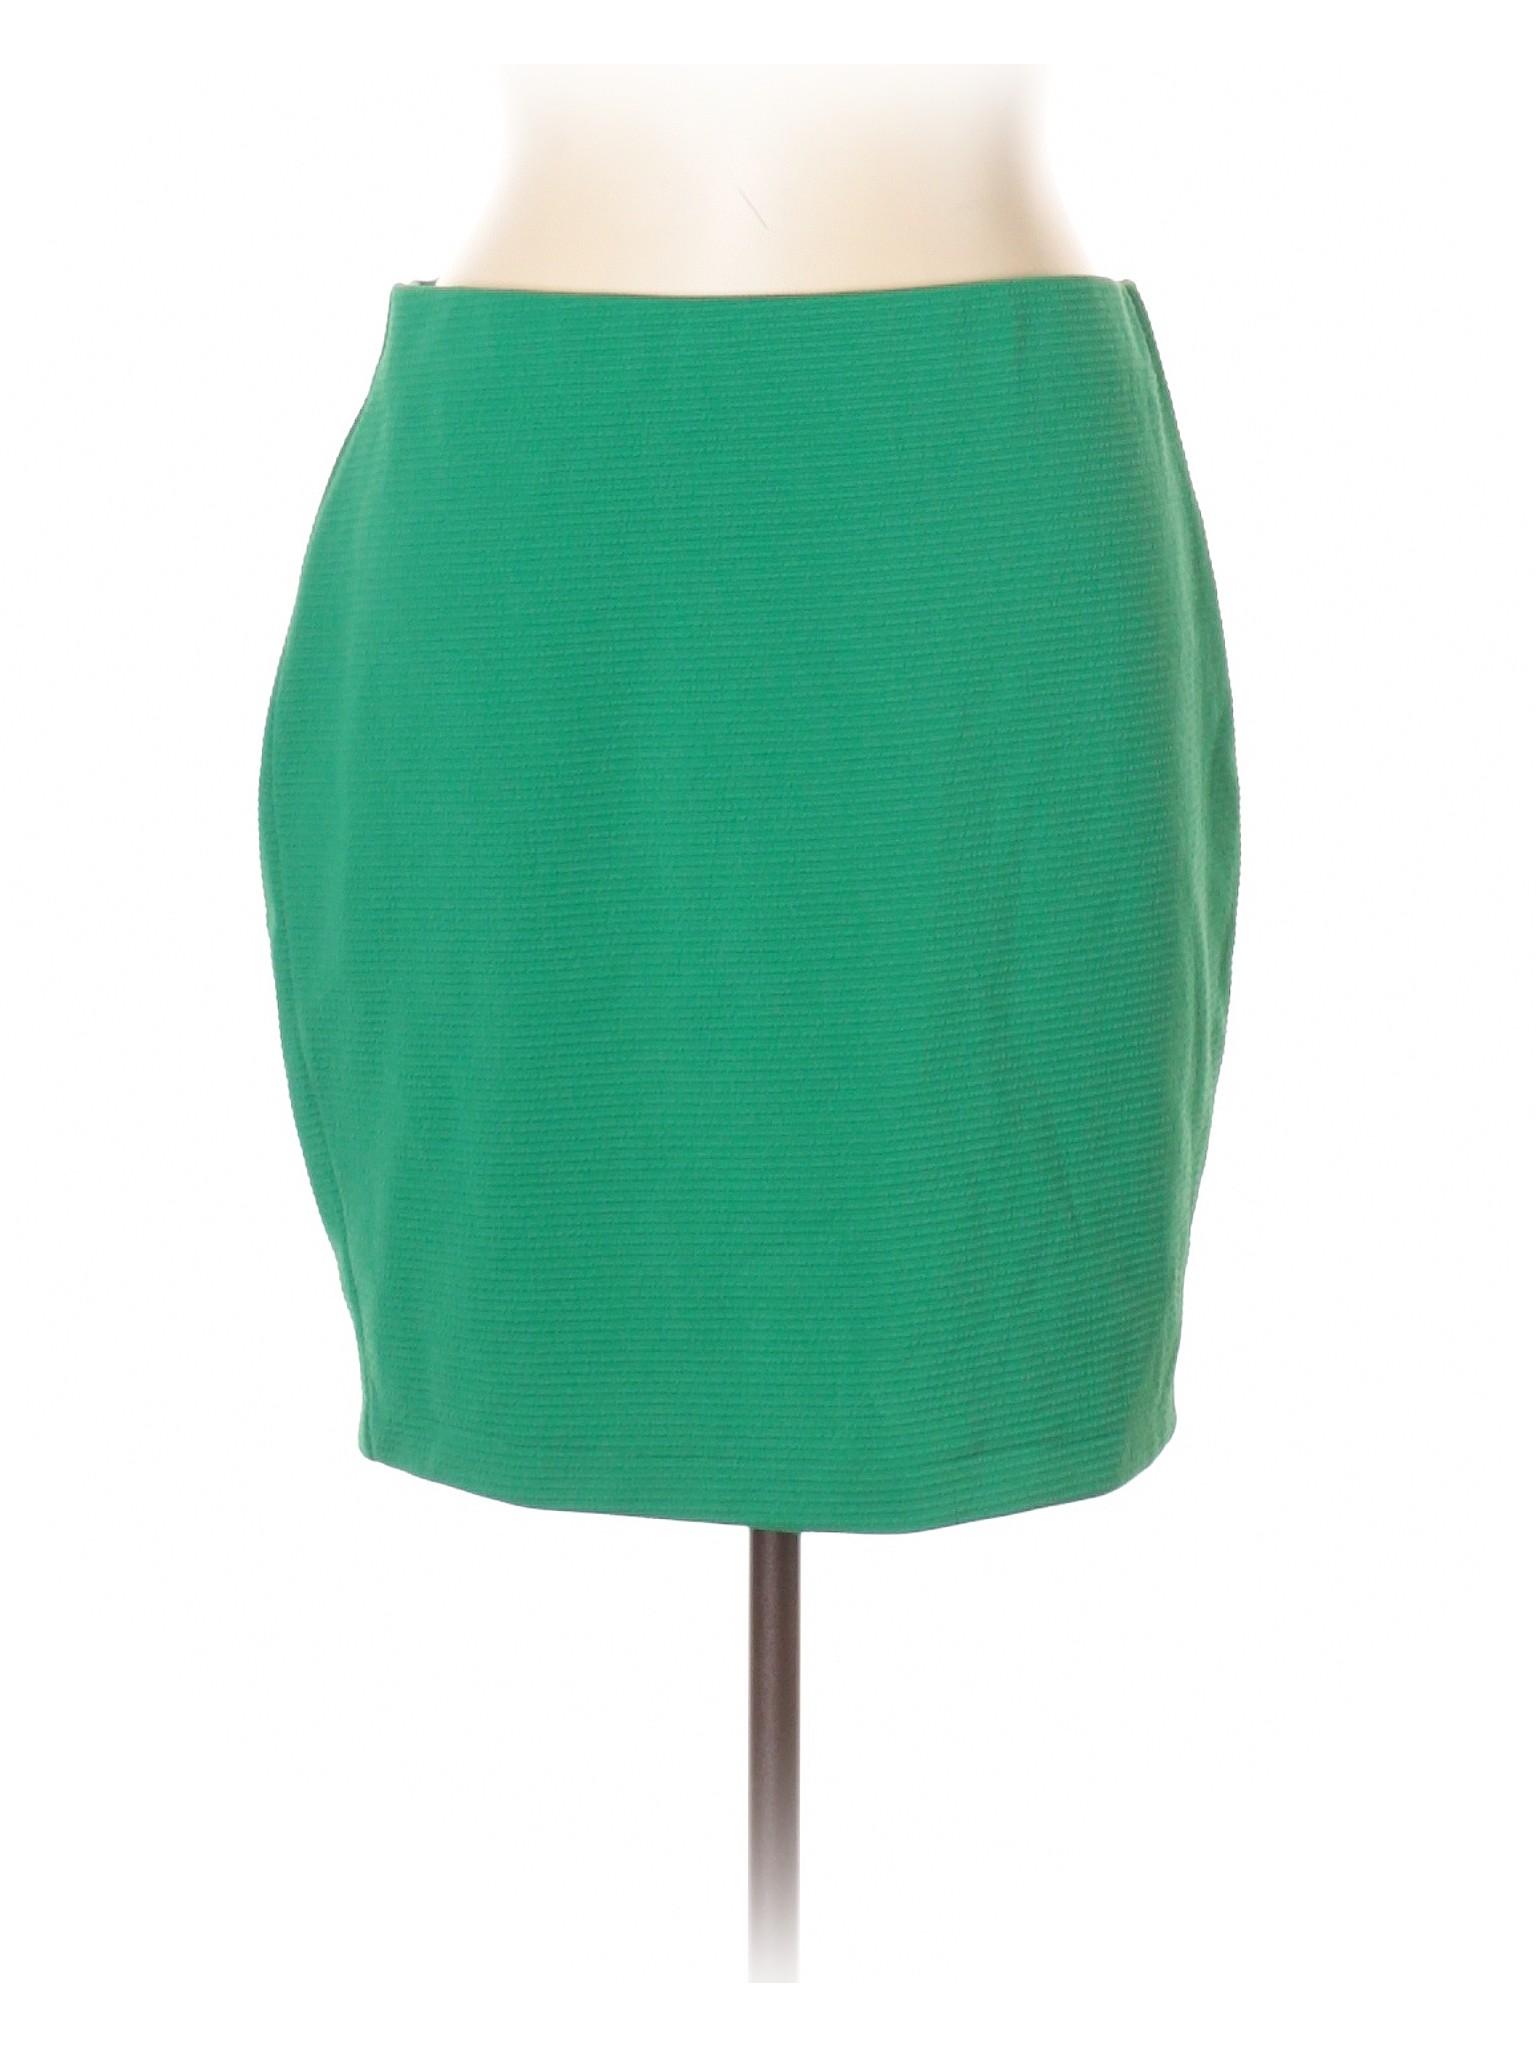 Boutique Casual Skirt Skirt Boutique Casual Casual Casual Skirt Skirt Skirt Boutique Boutique Boutique Boutique Casual Hd55wAPqx